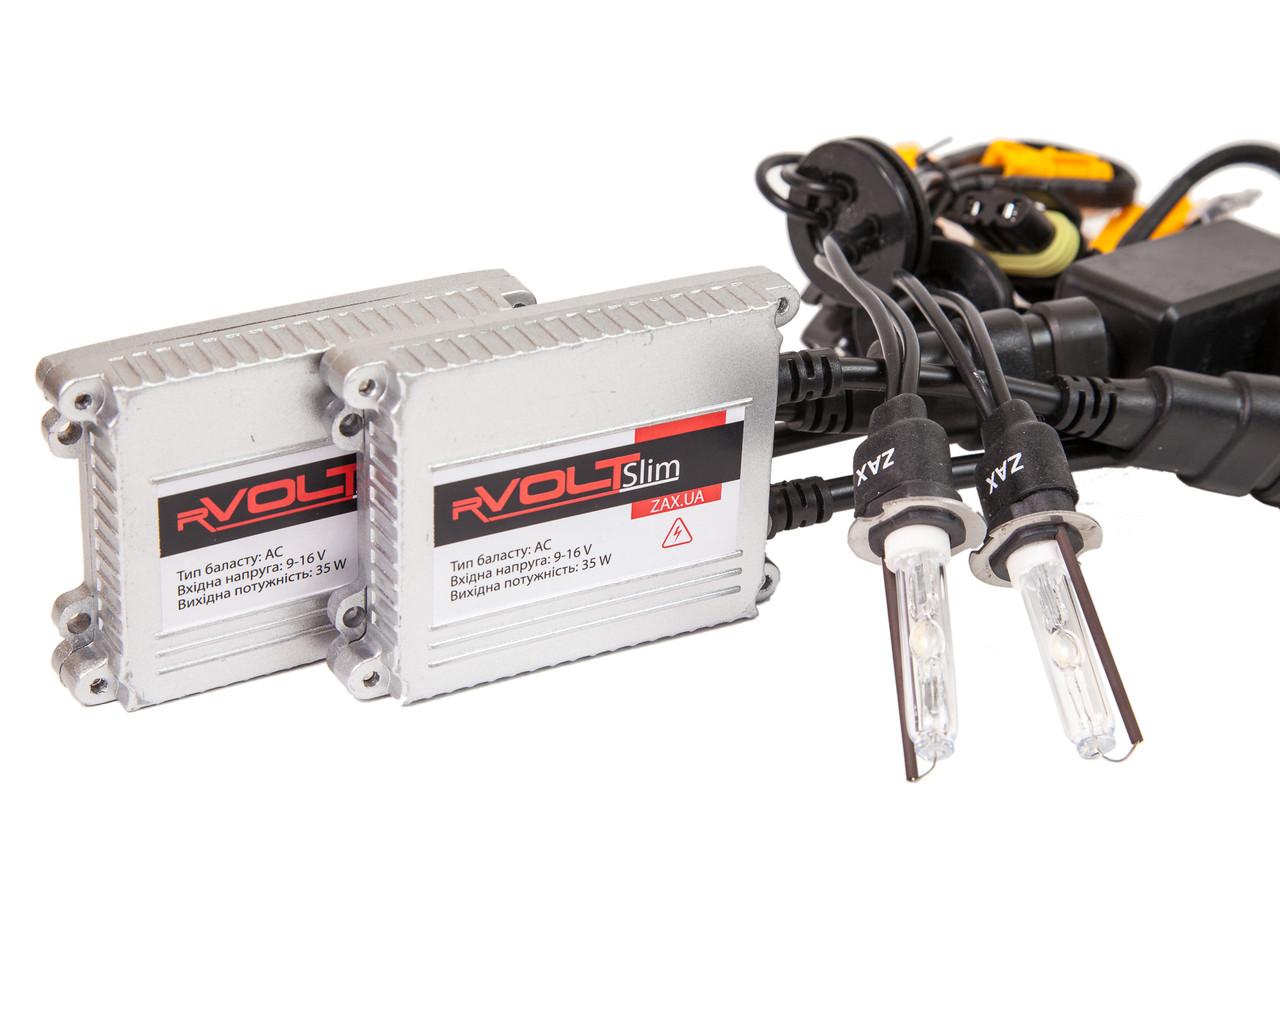 Комплект ксенона rVolt slim 35W 9-16V Zax ceramic H3 5000K